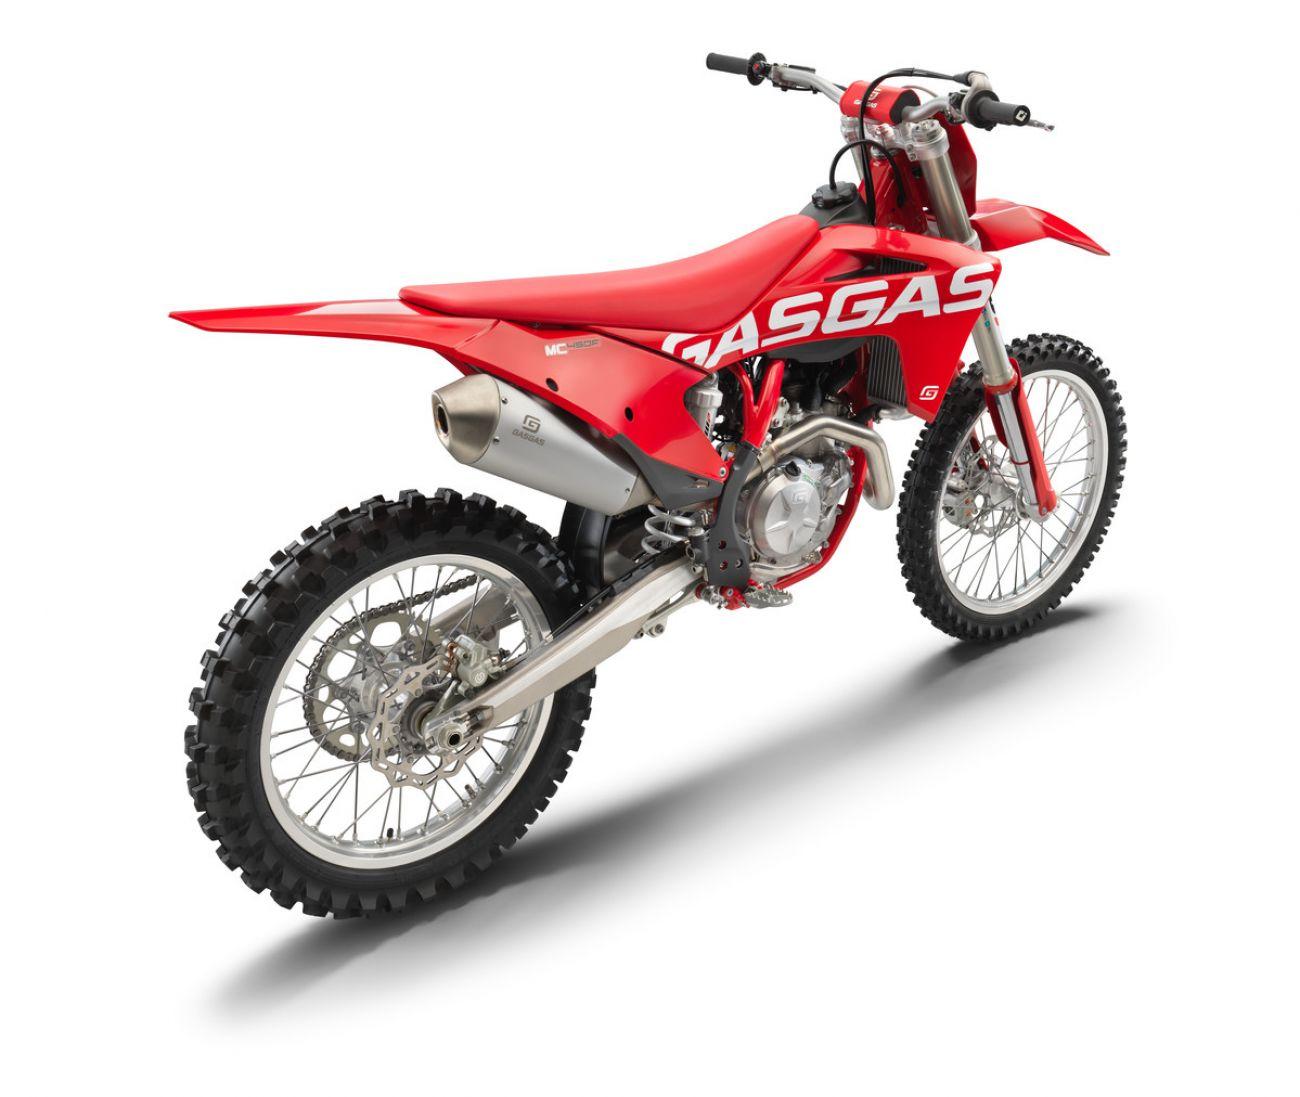 MOTORCYCLES GasGas MY21 MOTOCROSS MC_450F 3250_MC450Frearri_MY2021